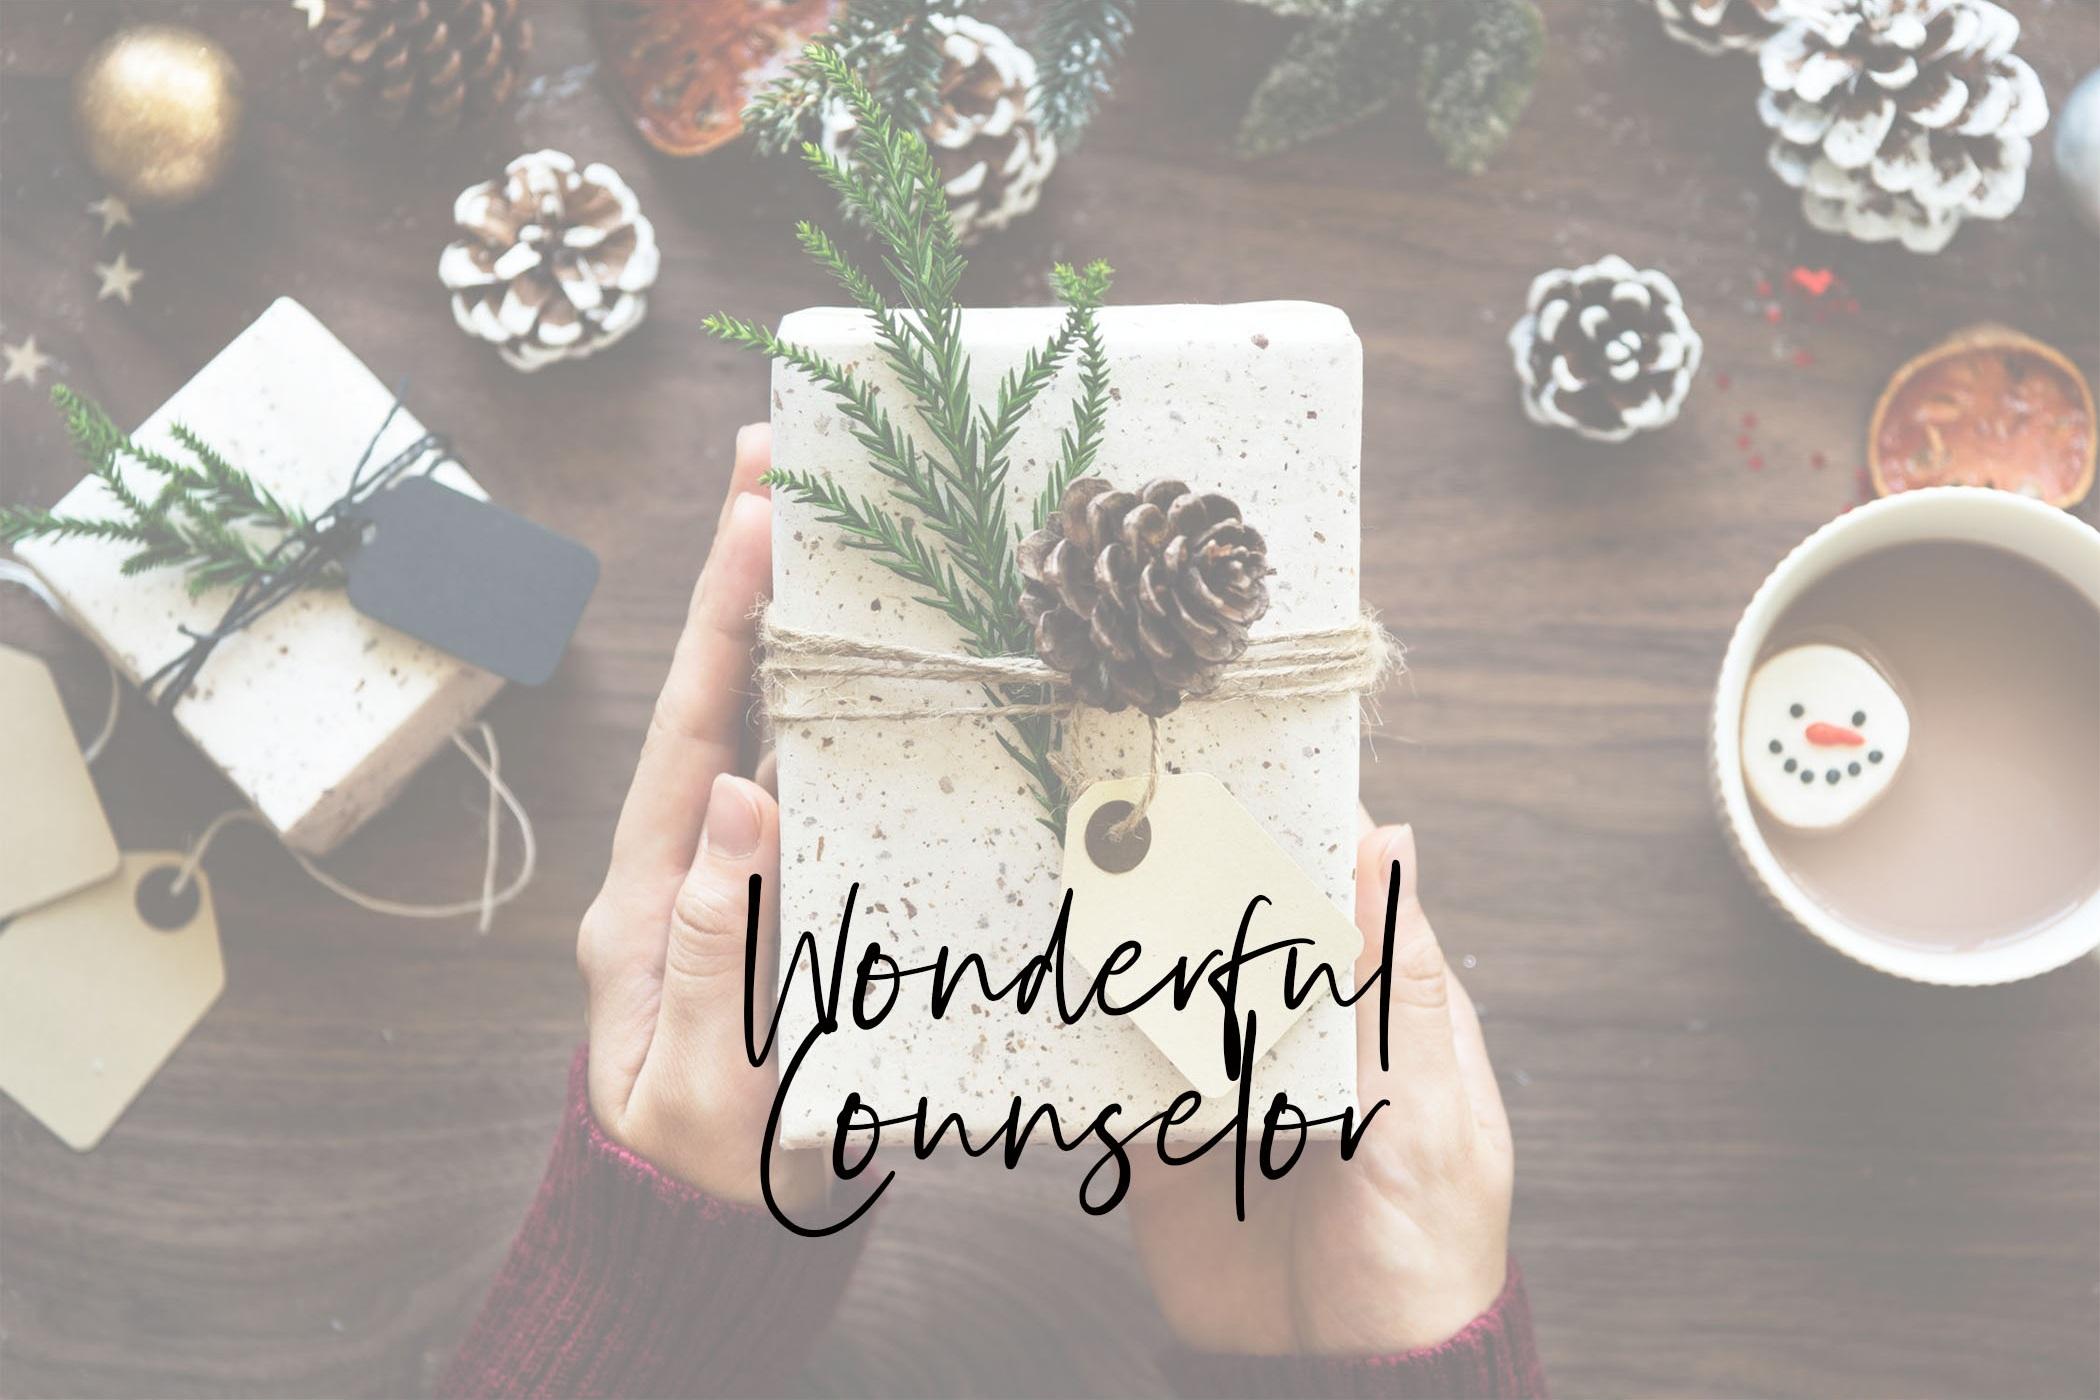 wonderful+counselor.jpg